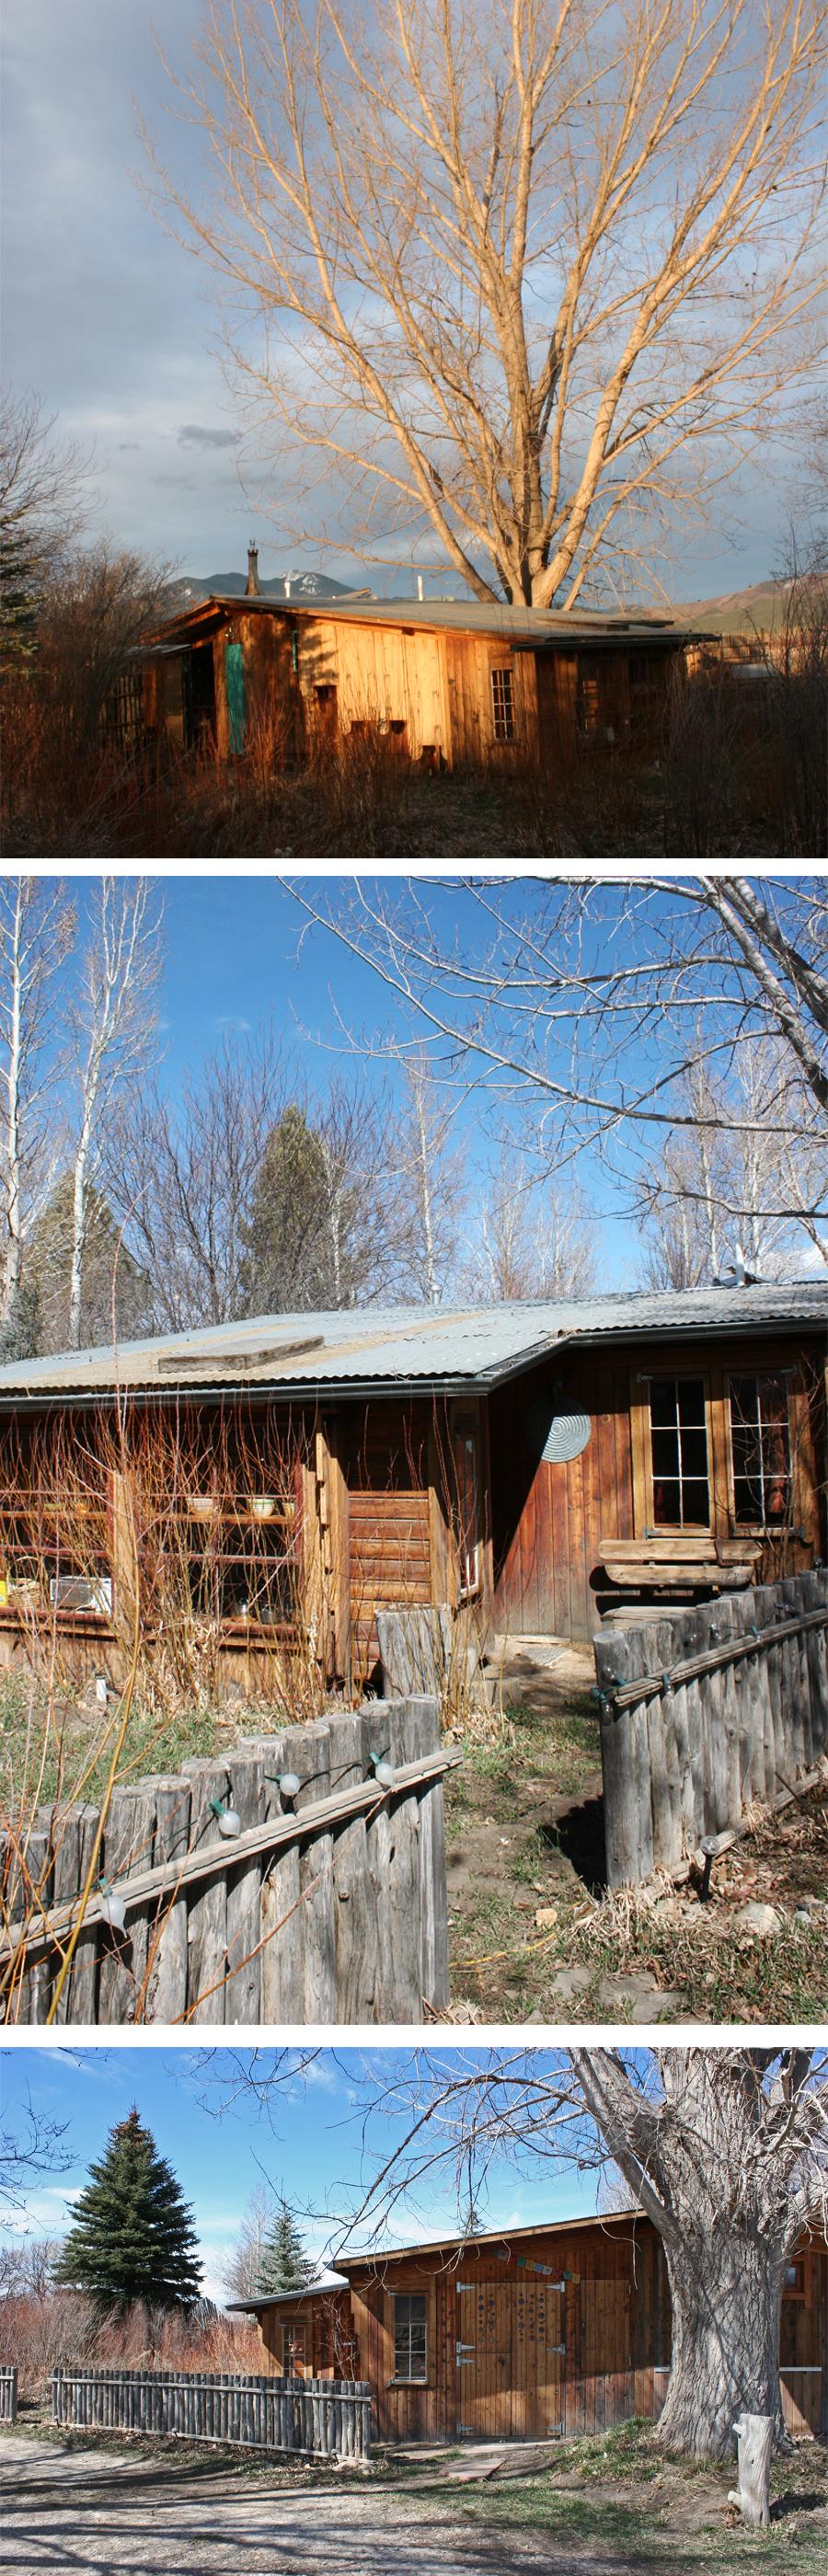 springwild Casita NM house